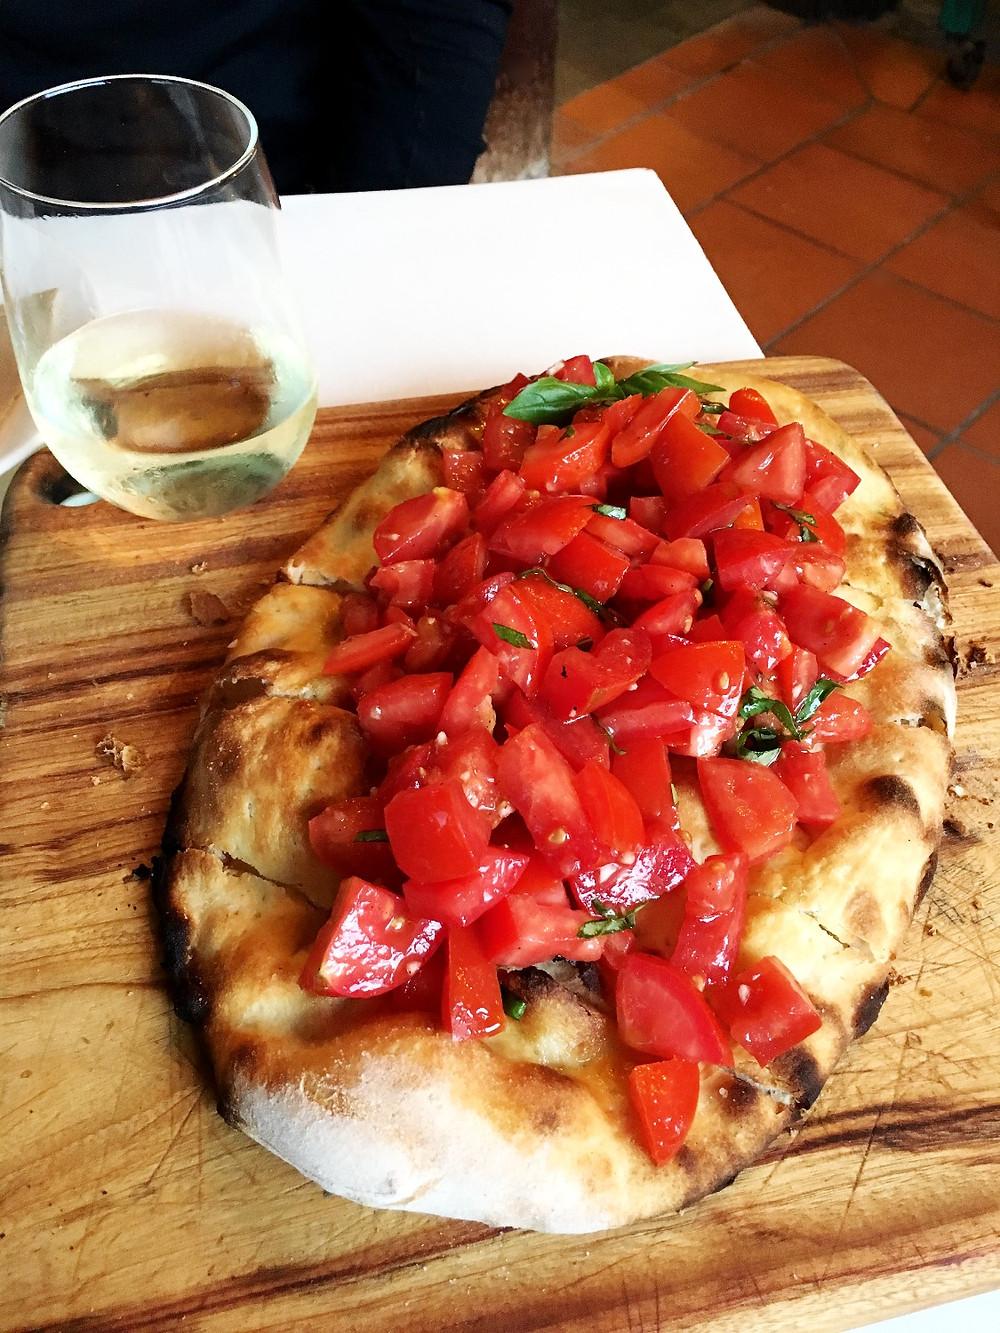 Bruschetta pizza with delicious local tomatoes